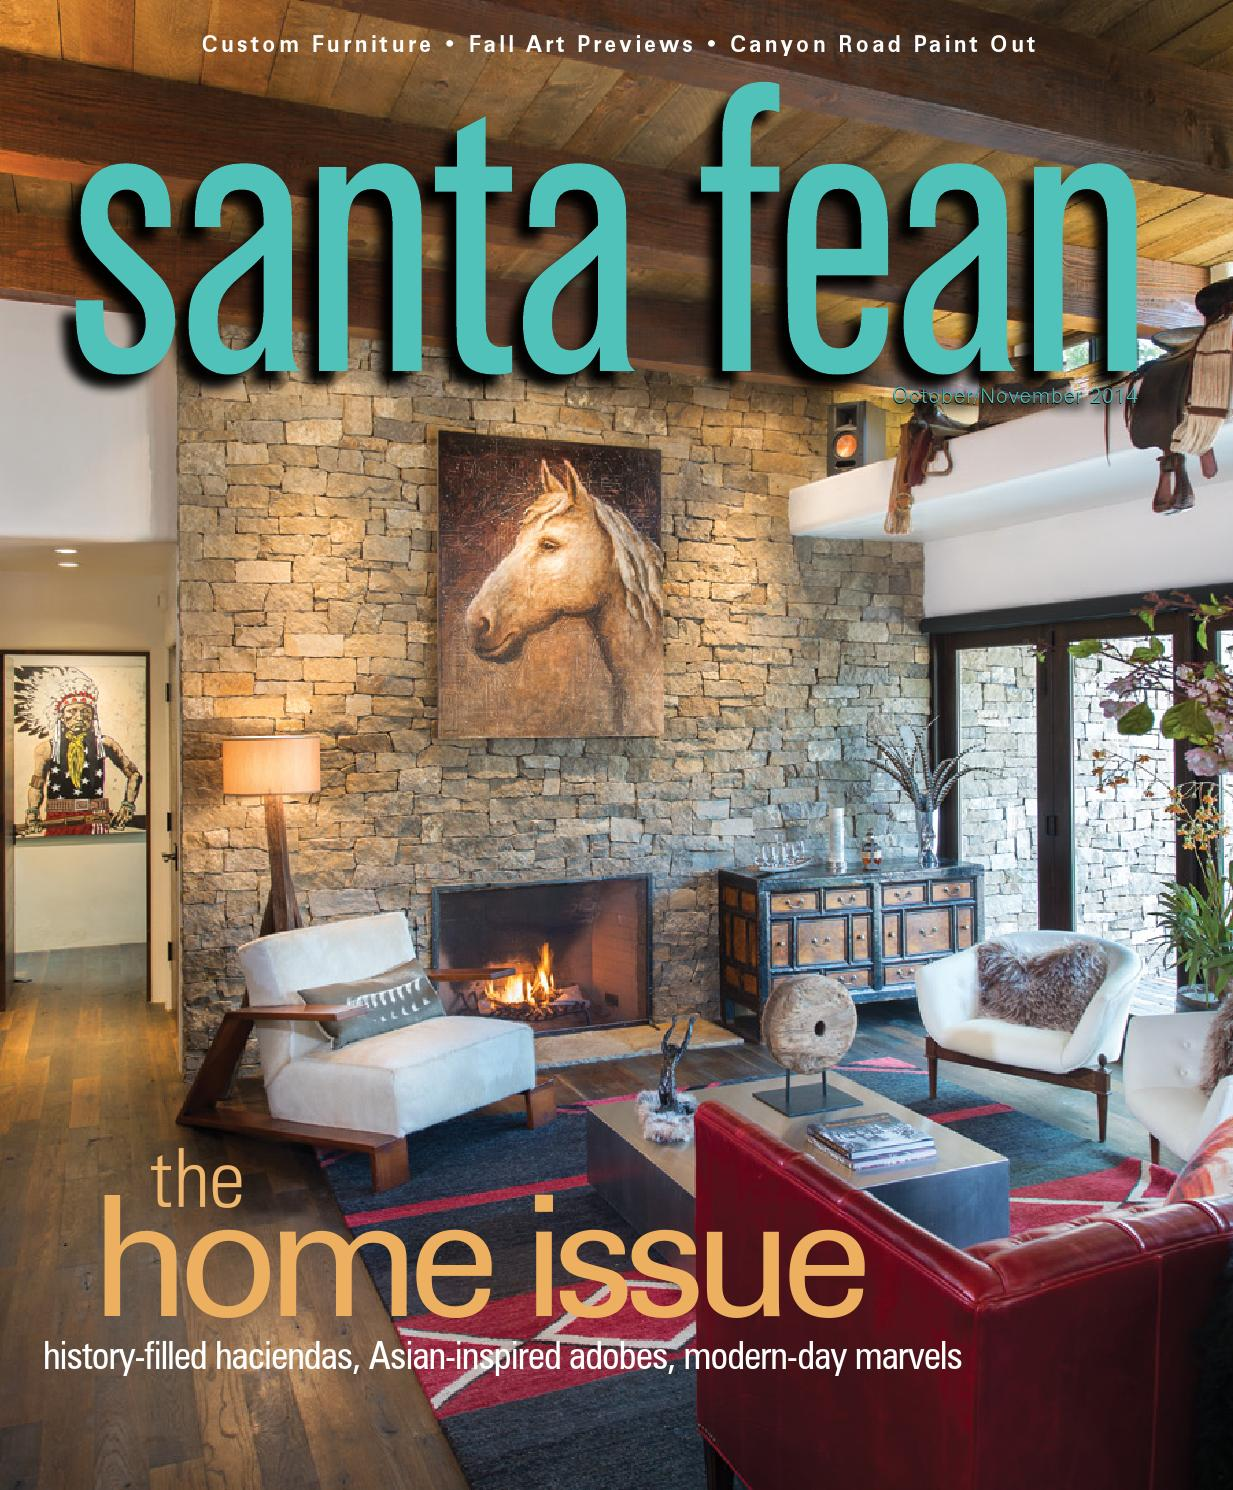 santa fean oct nov 2014 digital edition by bella media group issuuCoffee Table Book Sample Riparian Plaza Project Full.jpg #20